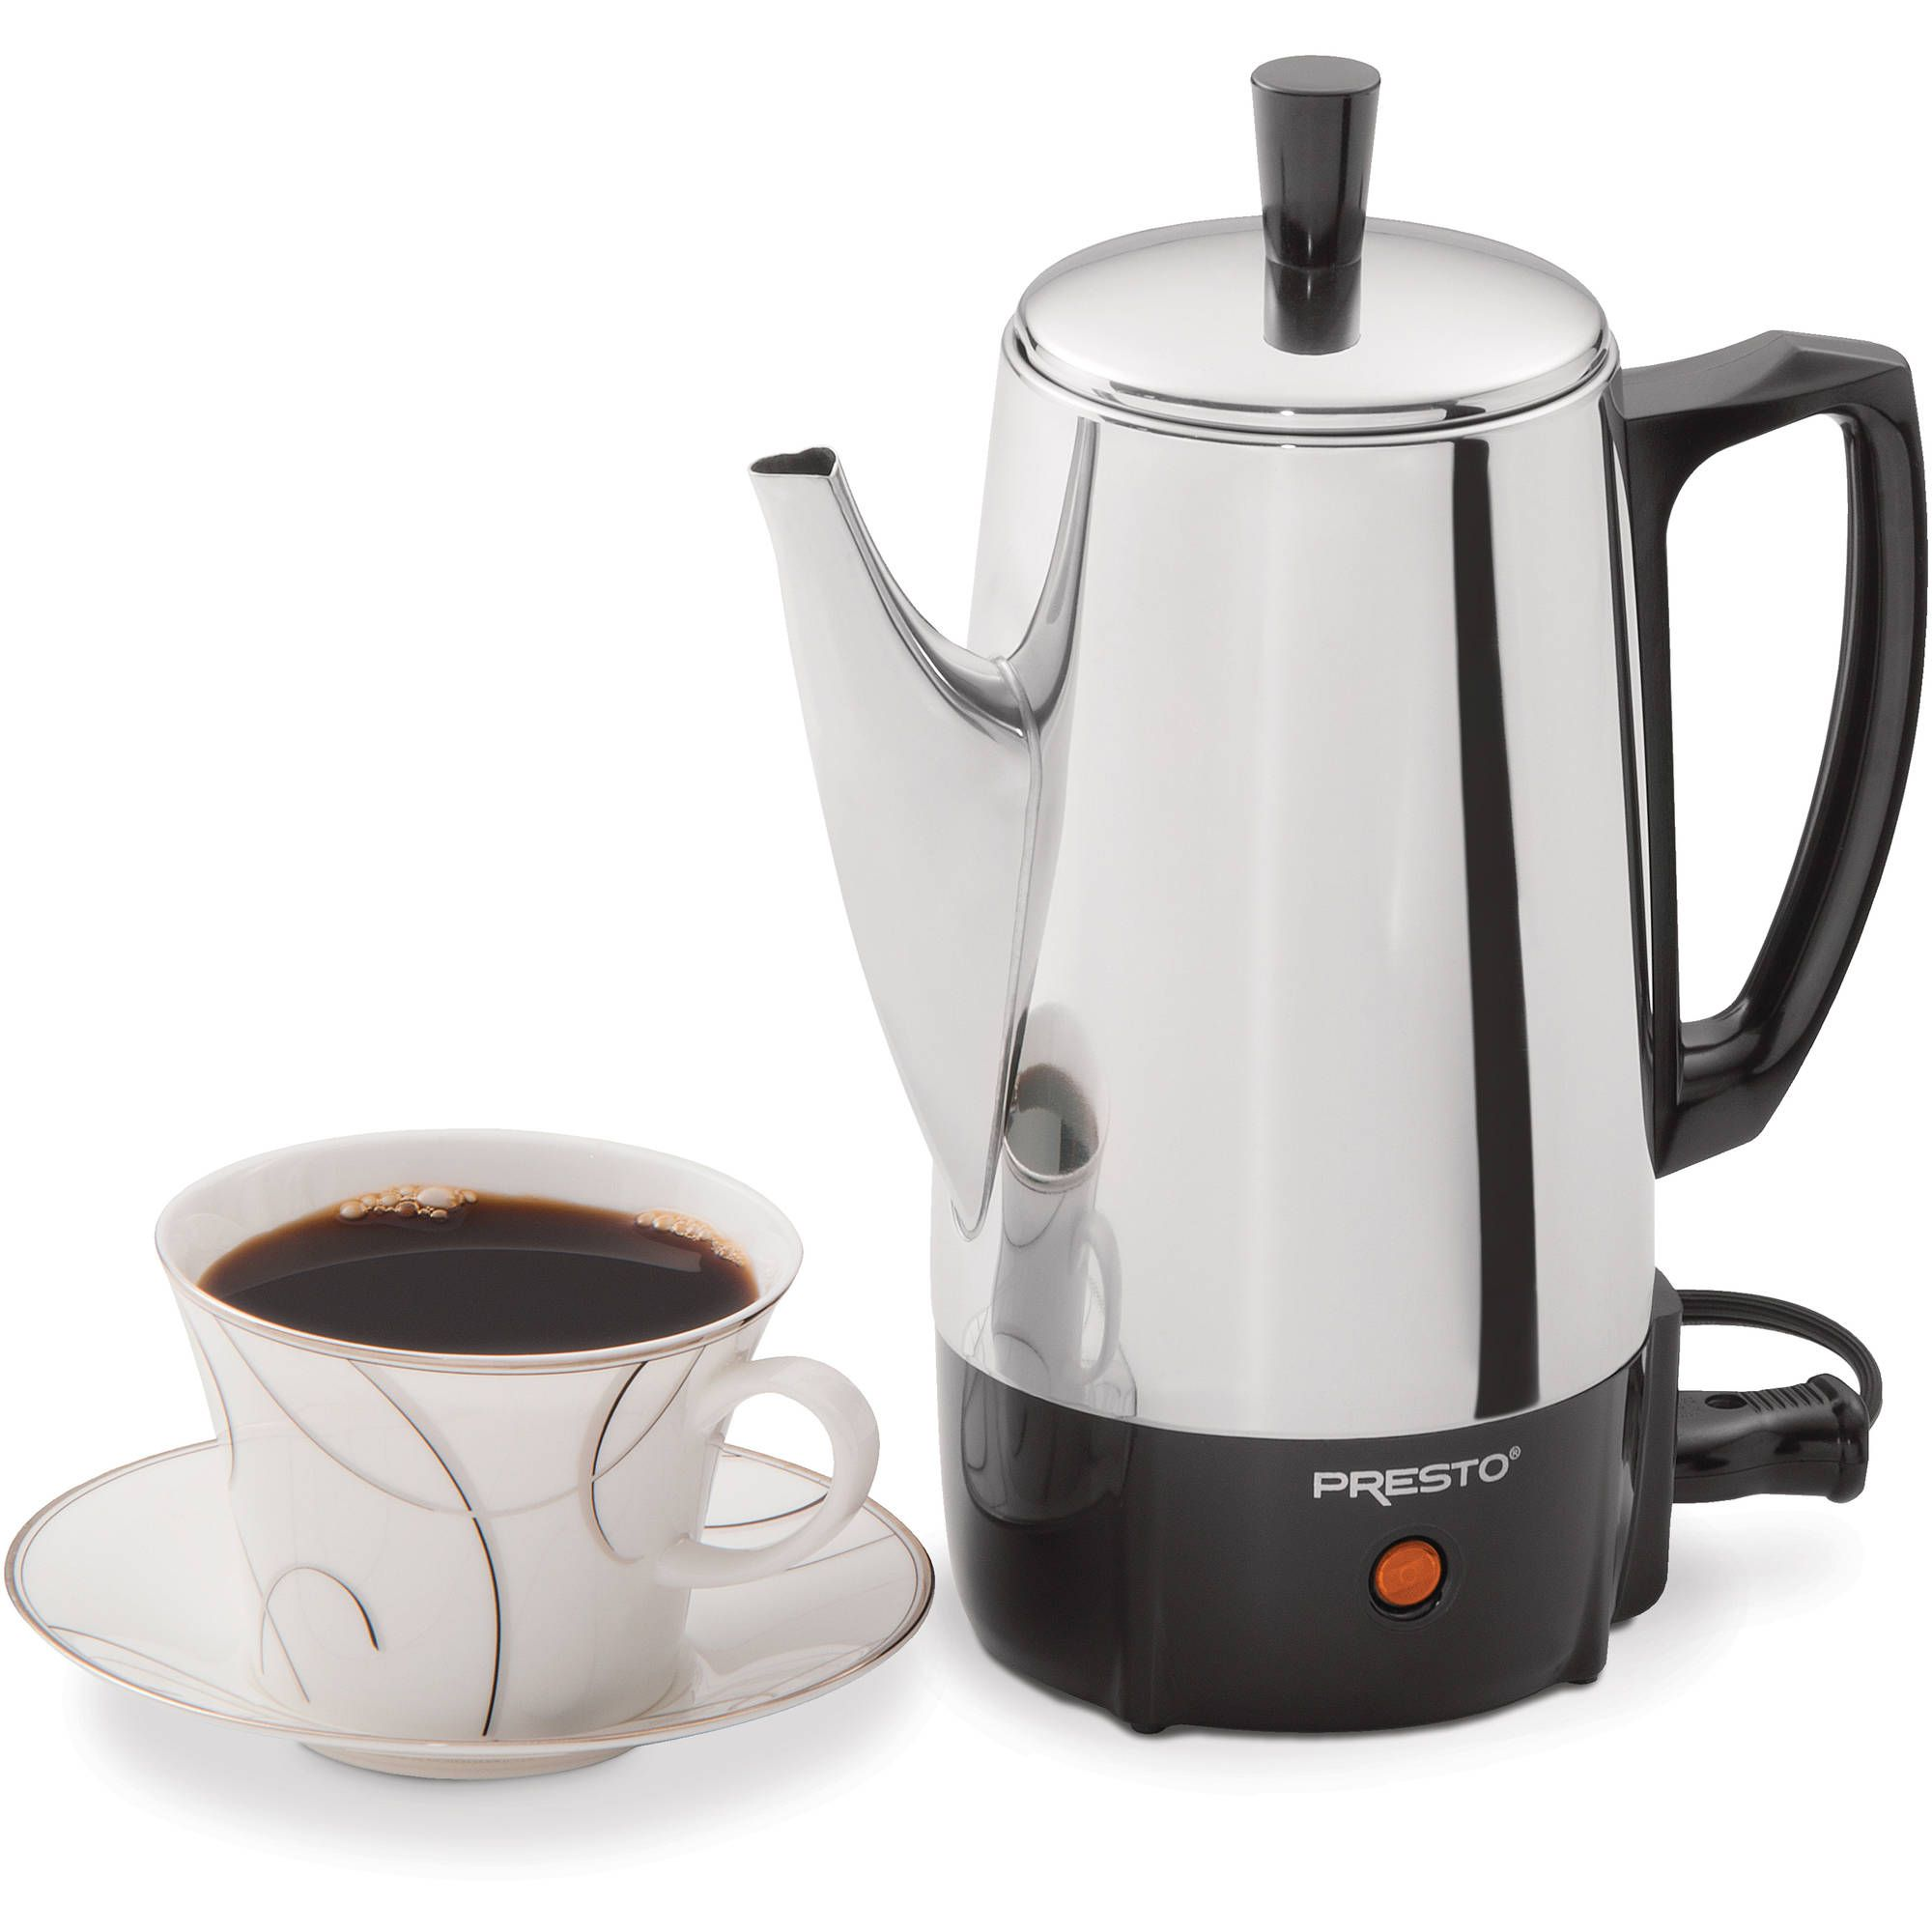 Presto 6Cup Stainless Steel Coffee Maker 02822 Walmart